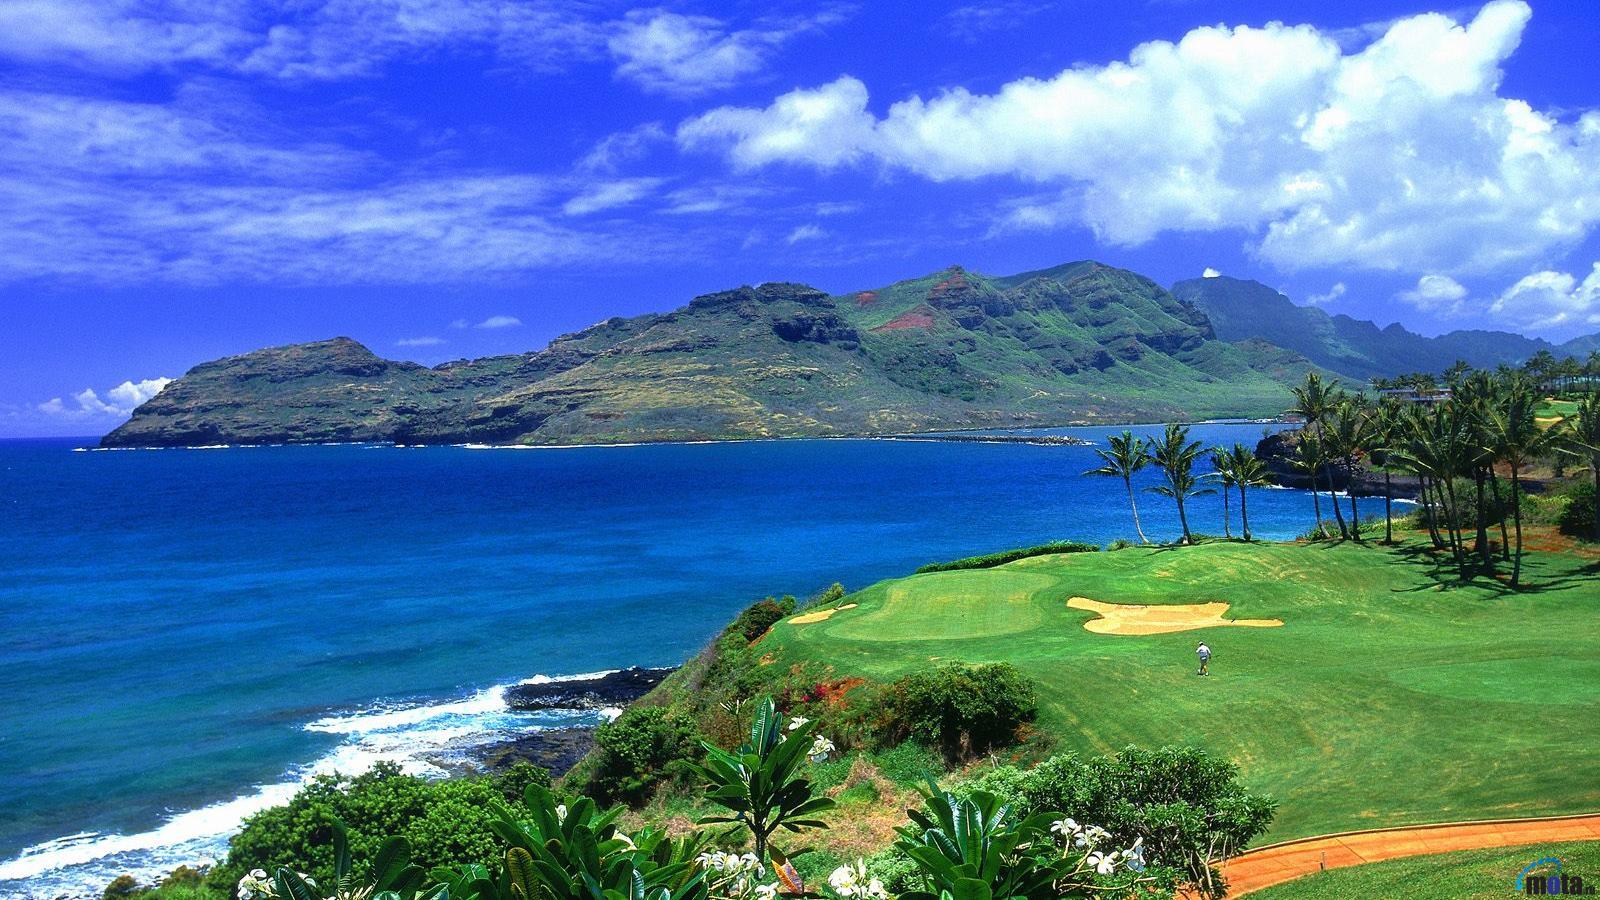 Download Wallpaper Golf Course in Hawaii 1600 x 900 widescreen 1600x900